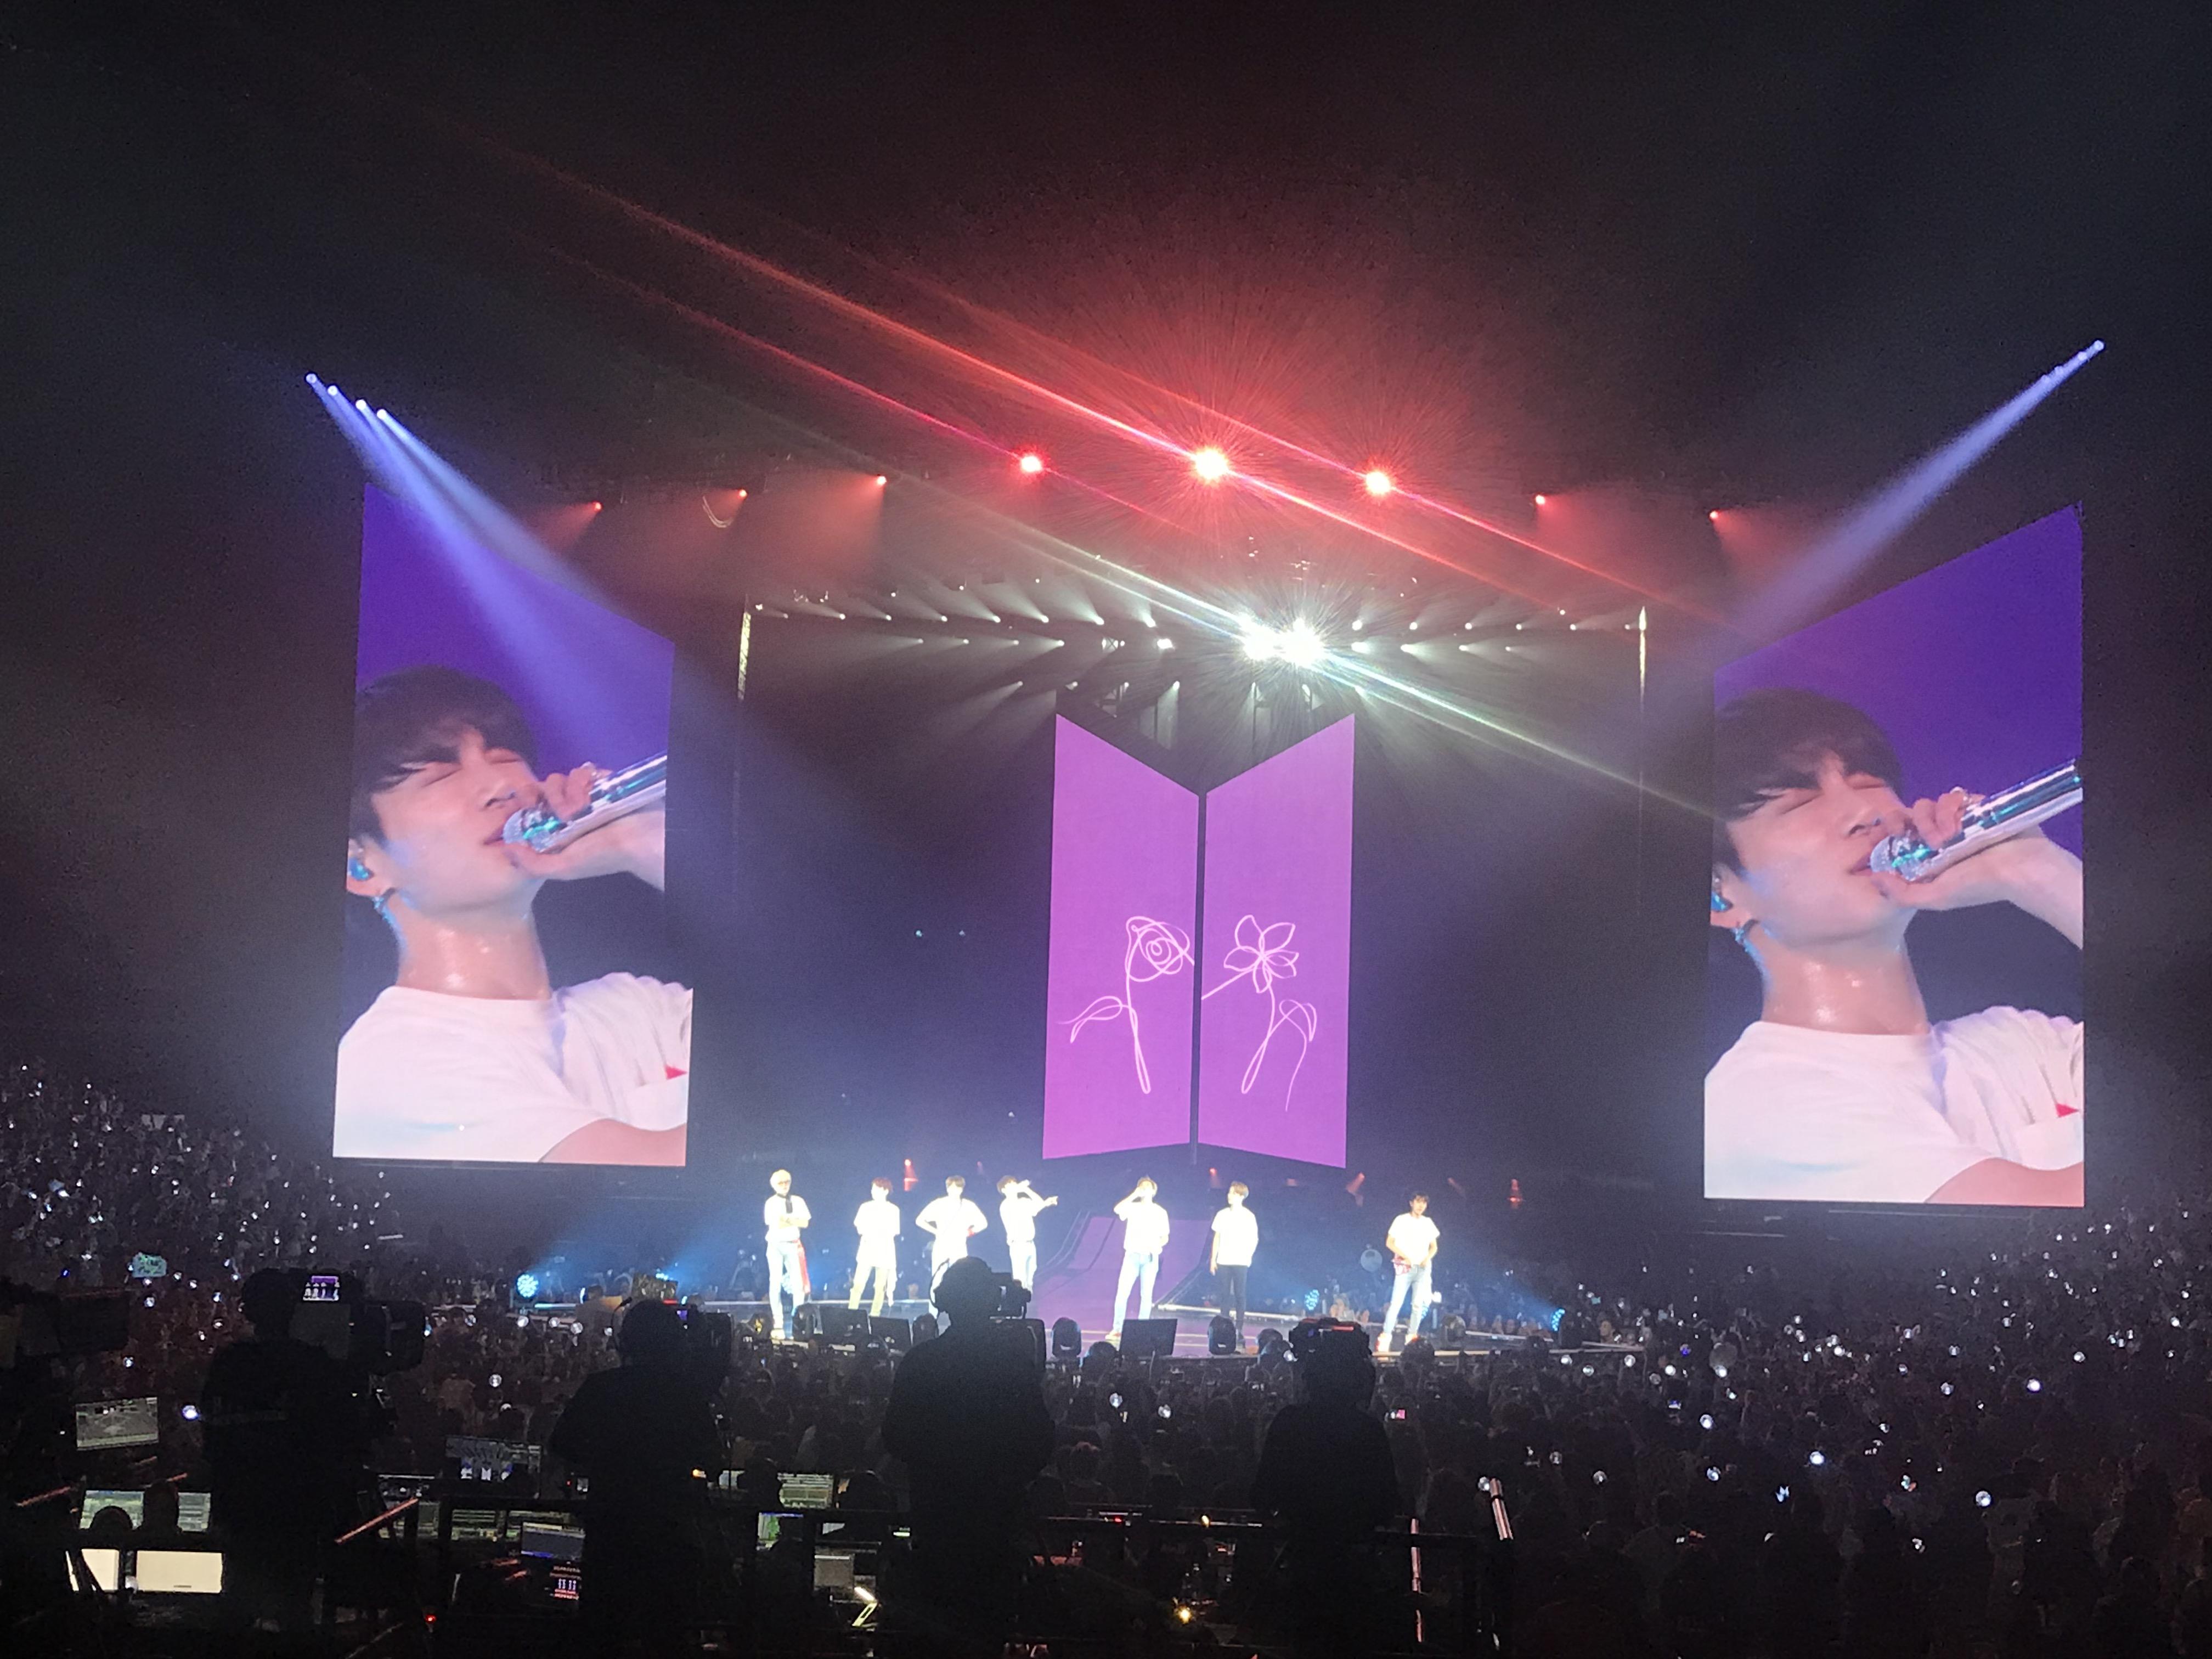 Marymekpop My Bts Love Yourself Concert Experience Marymekpop